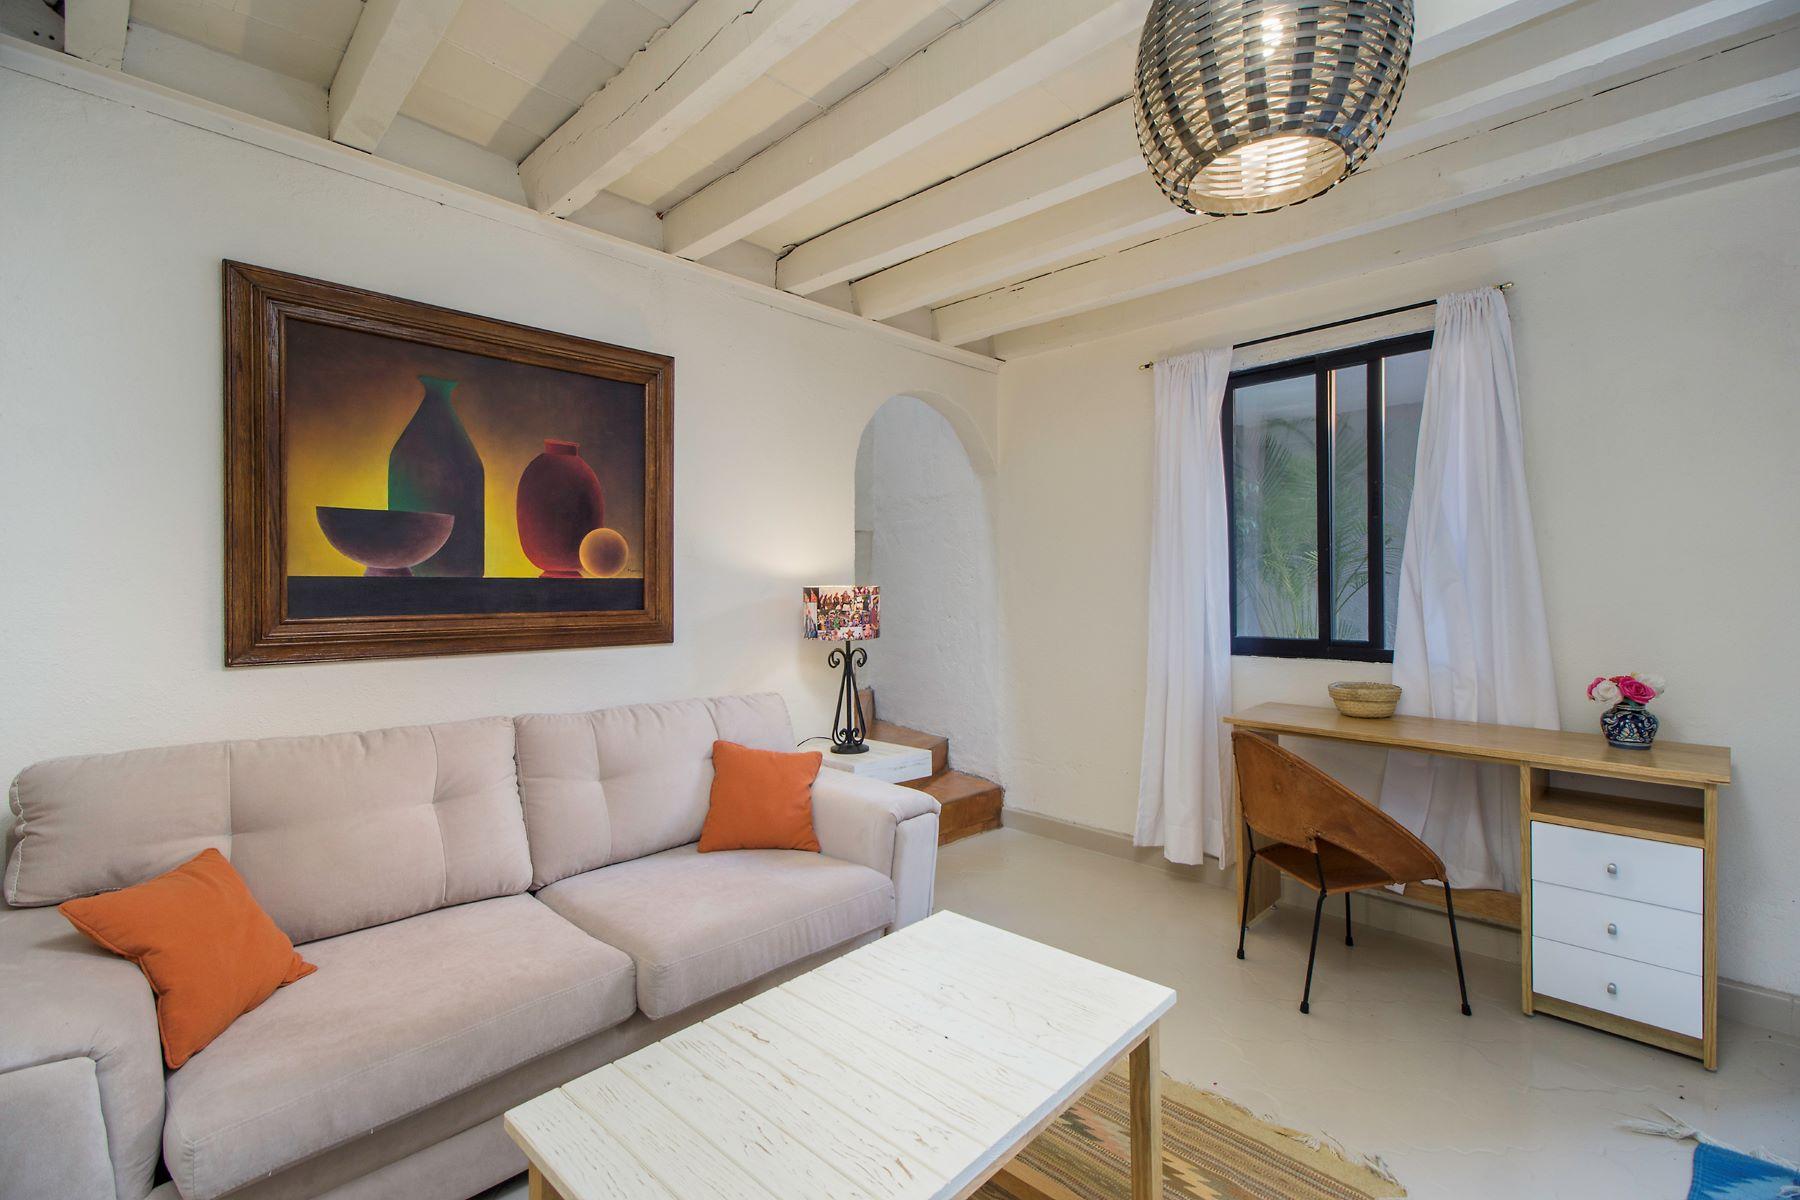 Additional photo for property listing at Casitas Aparicio Centro, San Miguel De Allende, Guanajuato Mexico